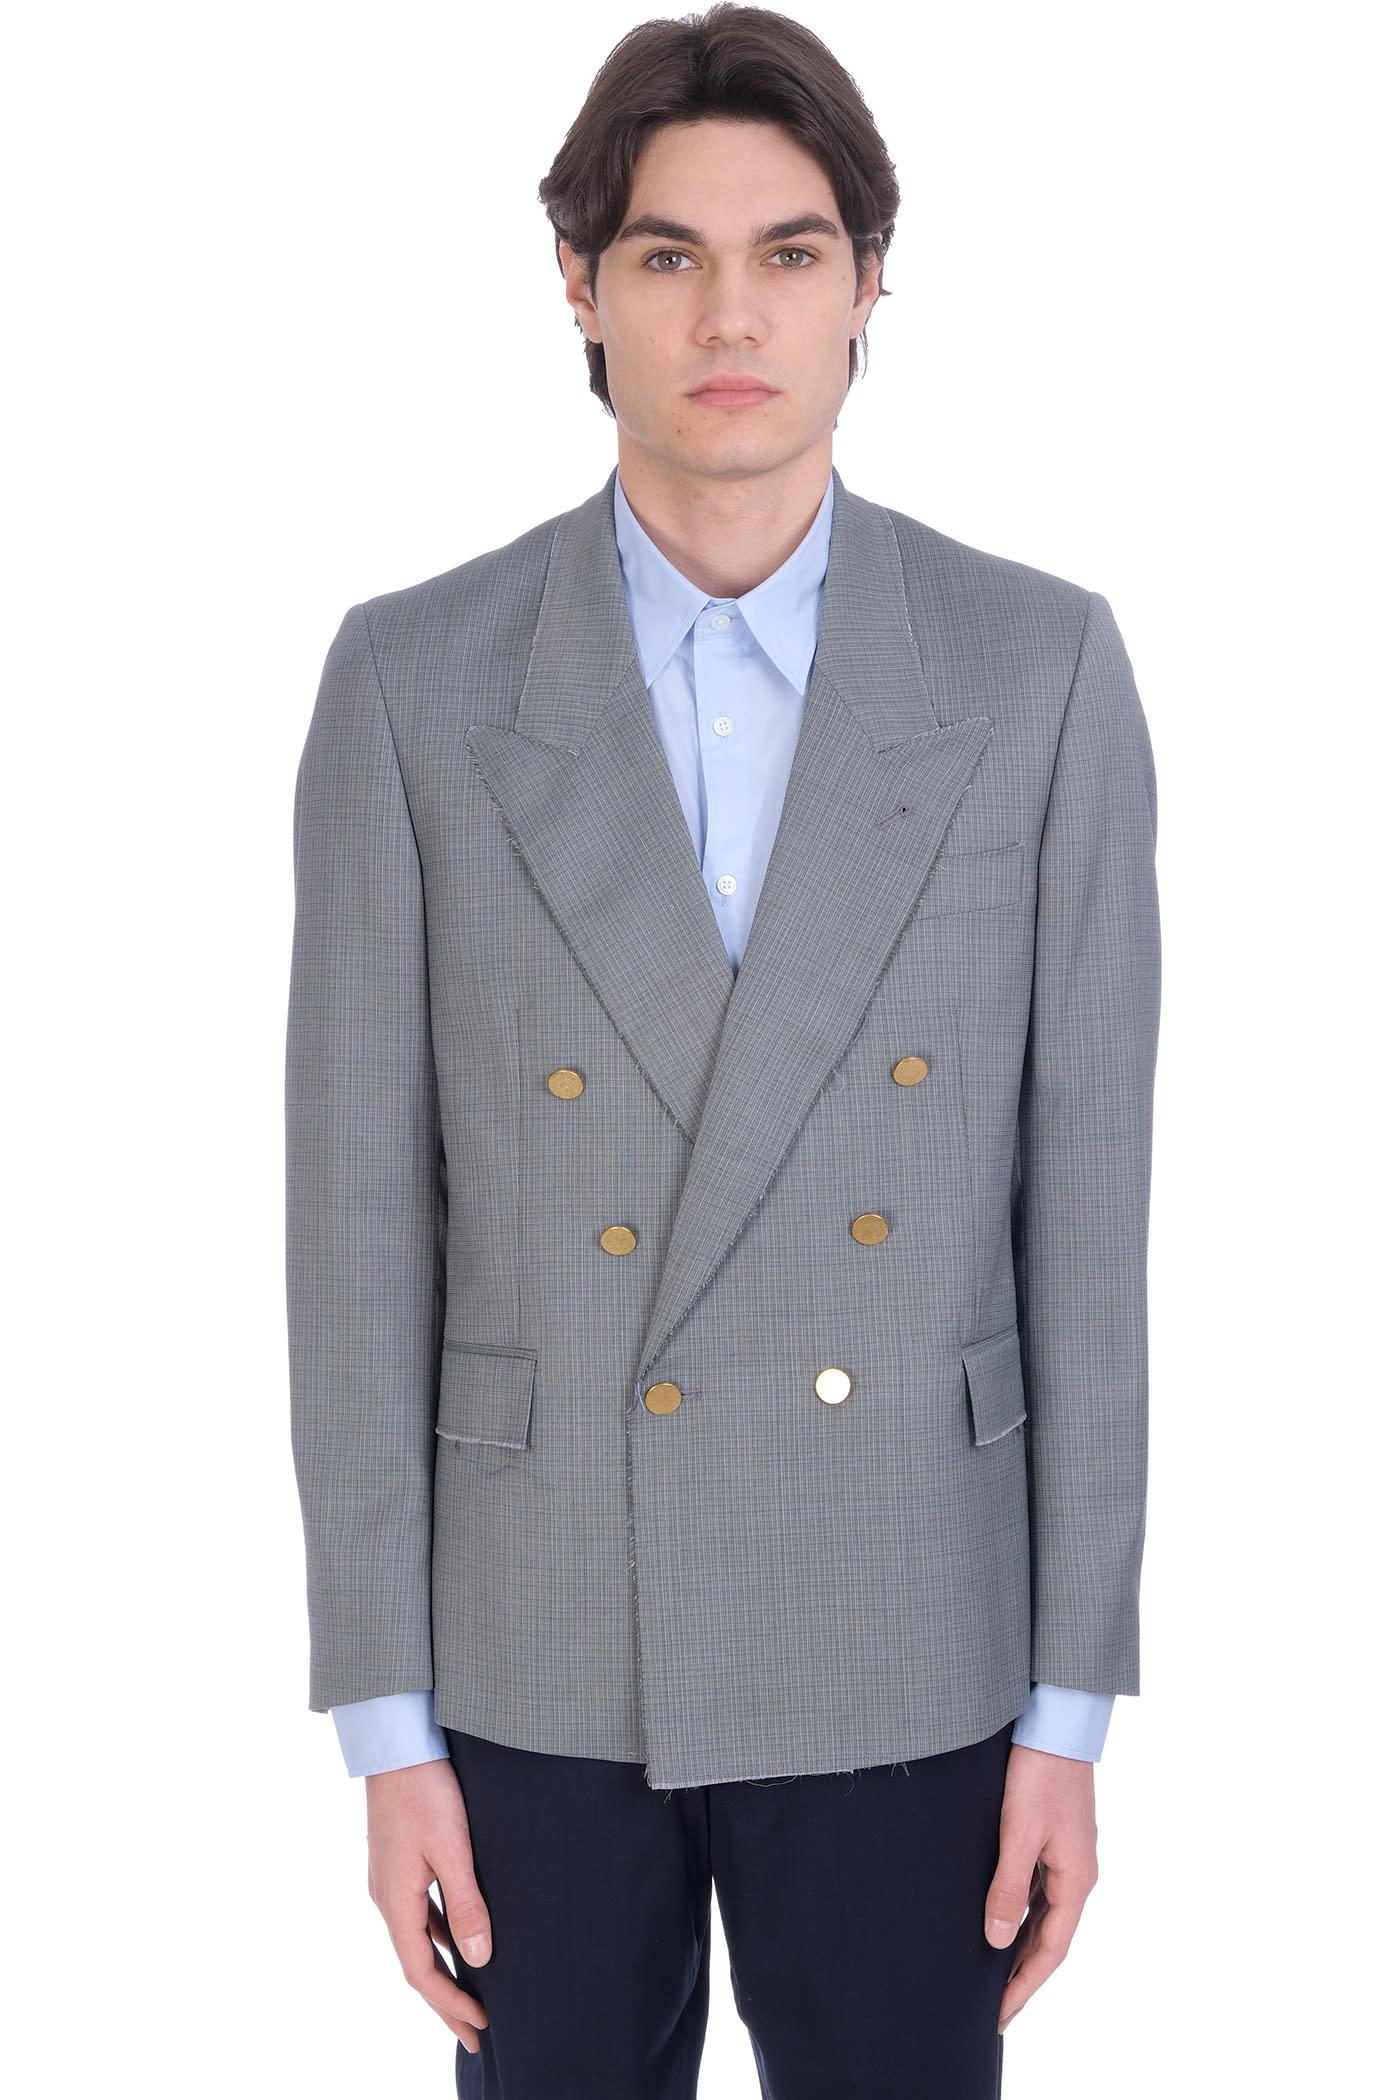 Jacket In Grey Wool